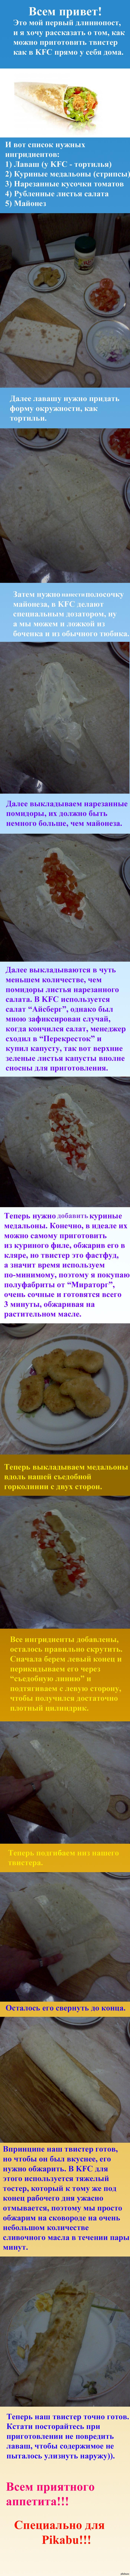 Готовим твистер как в KFC у себя дома))